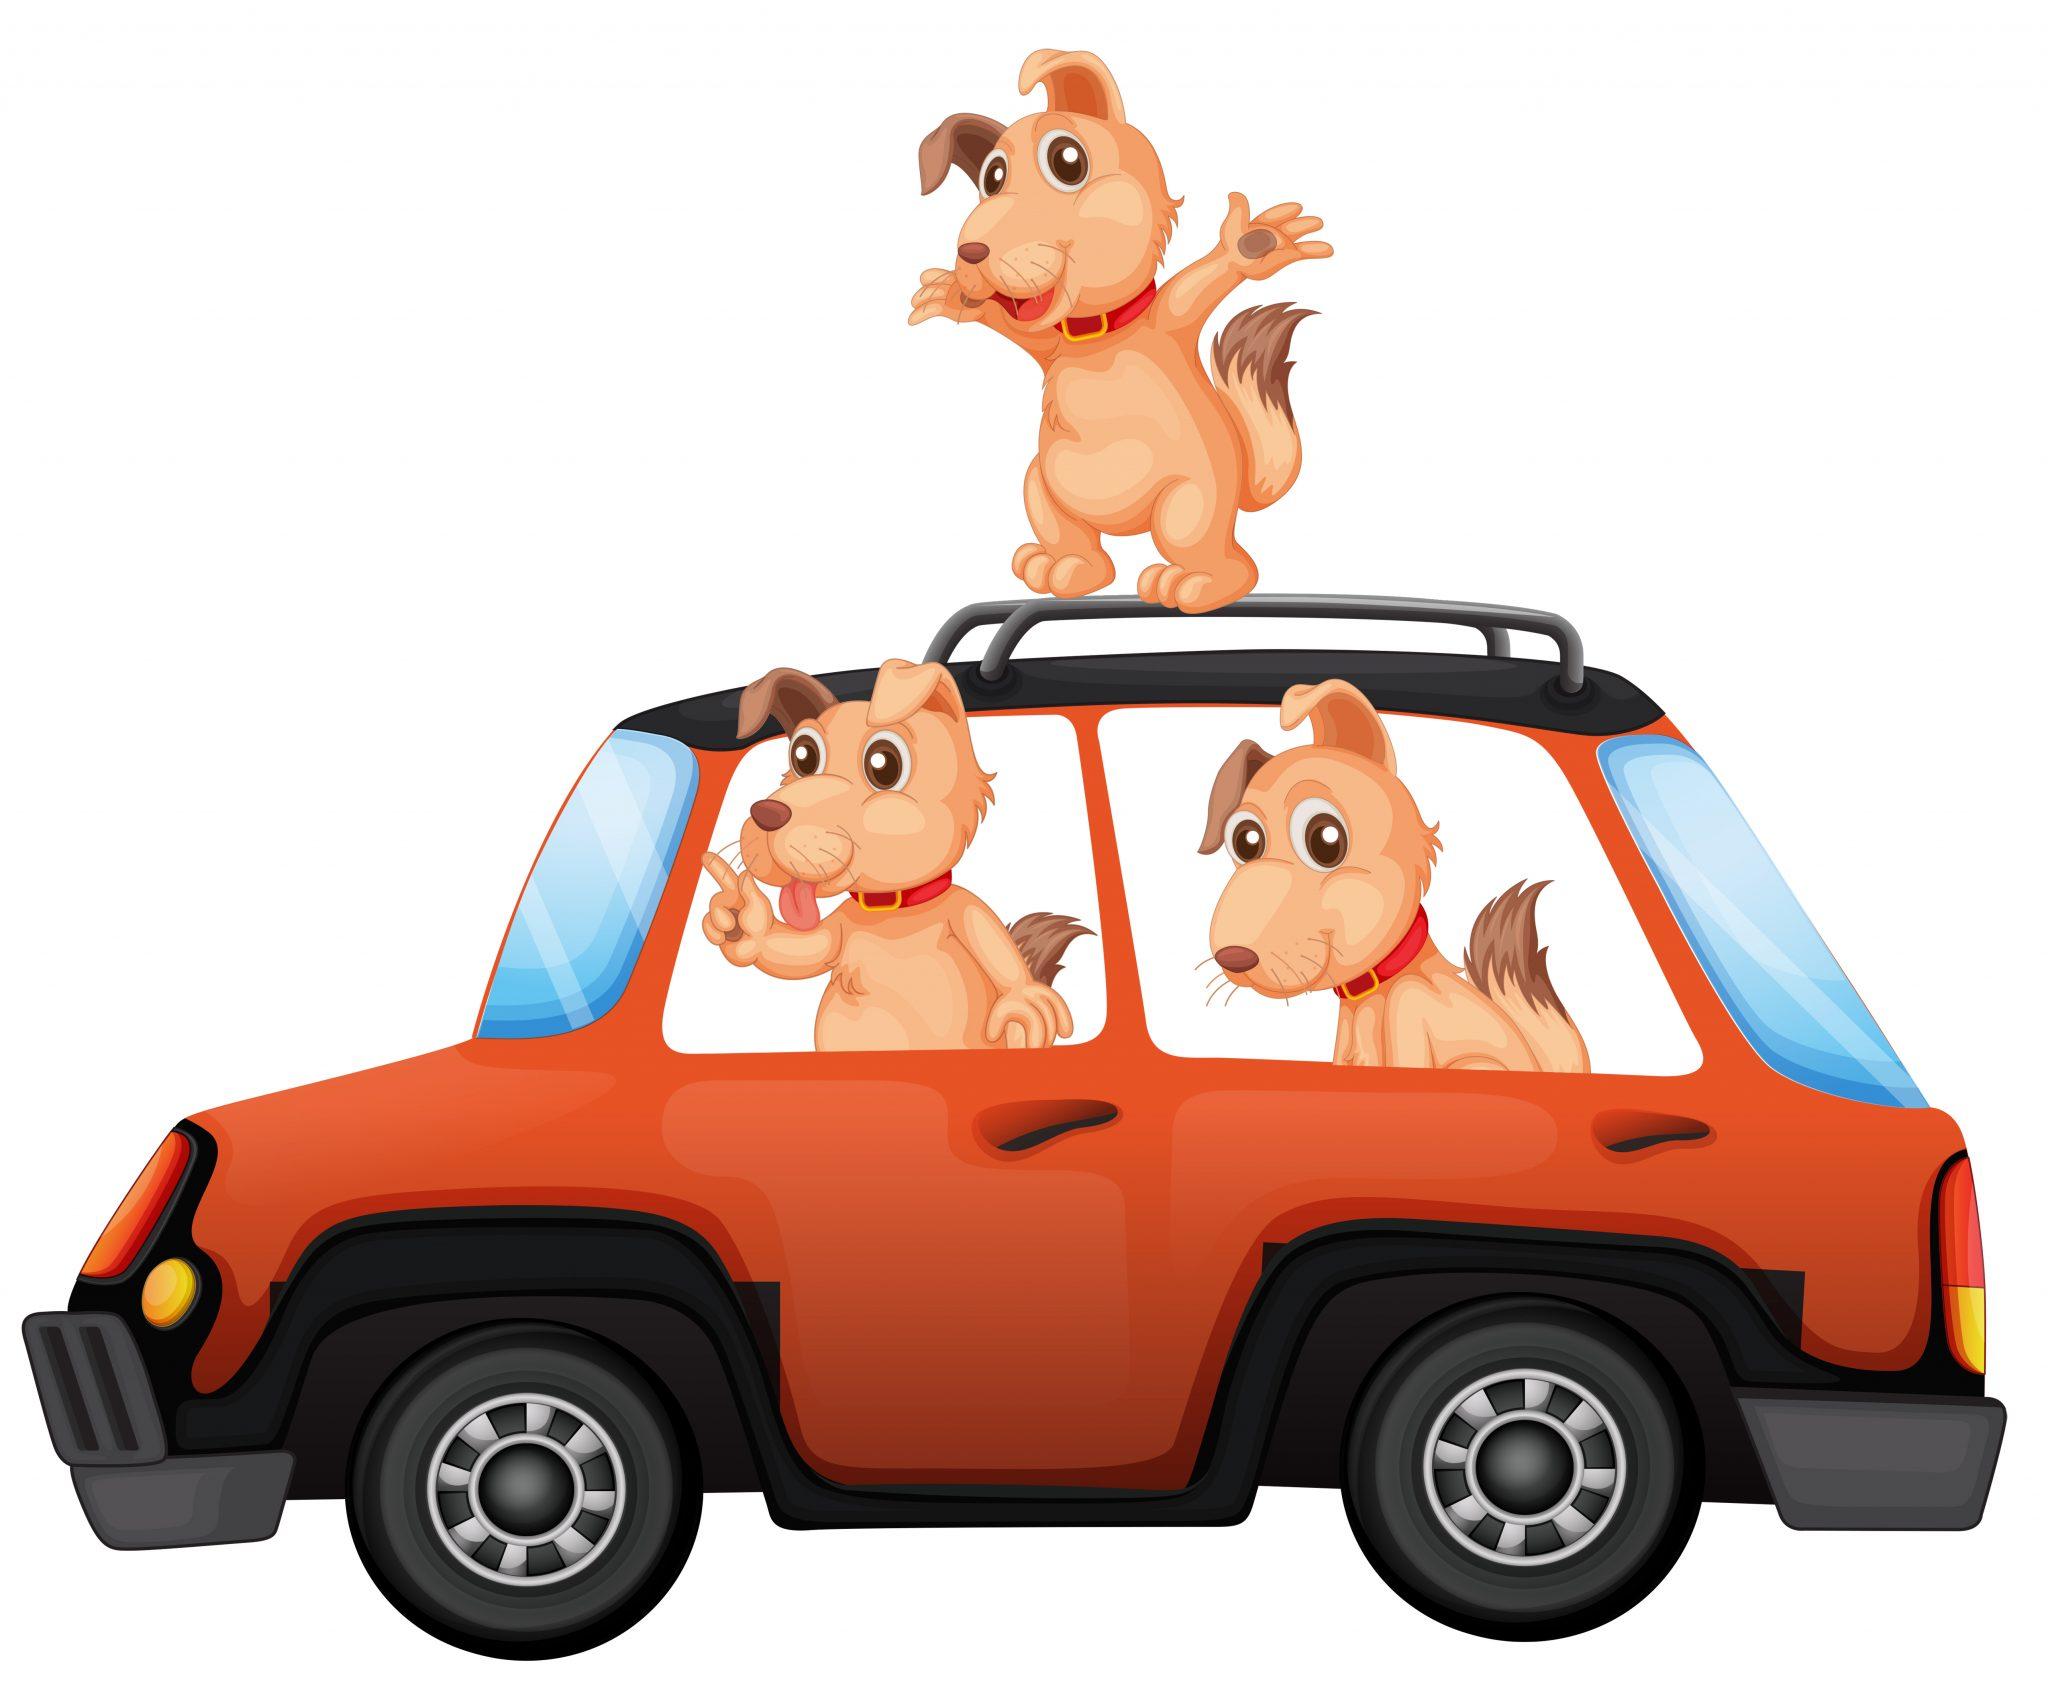 Car Travel with a Dog - 3 cartoon dogs in a car